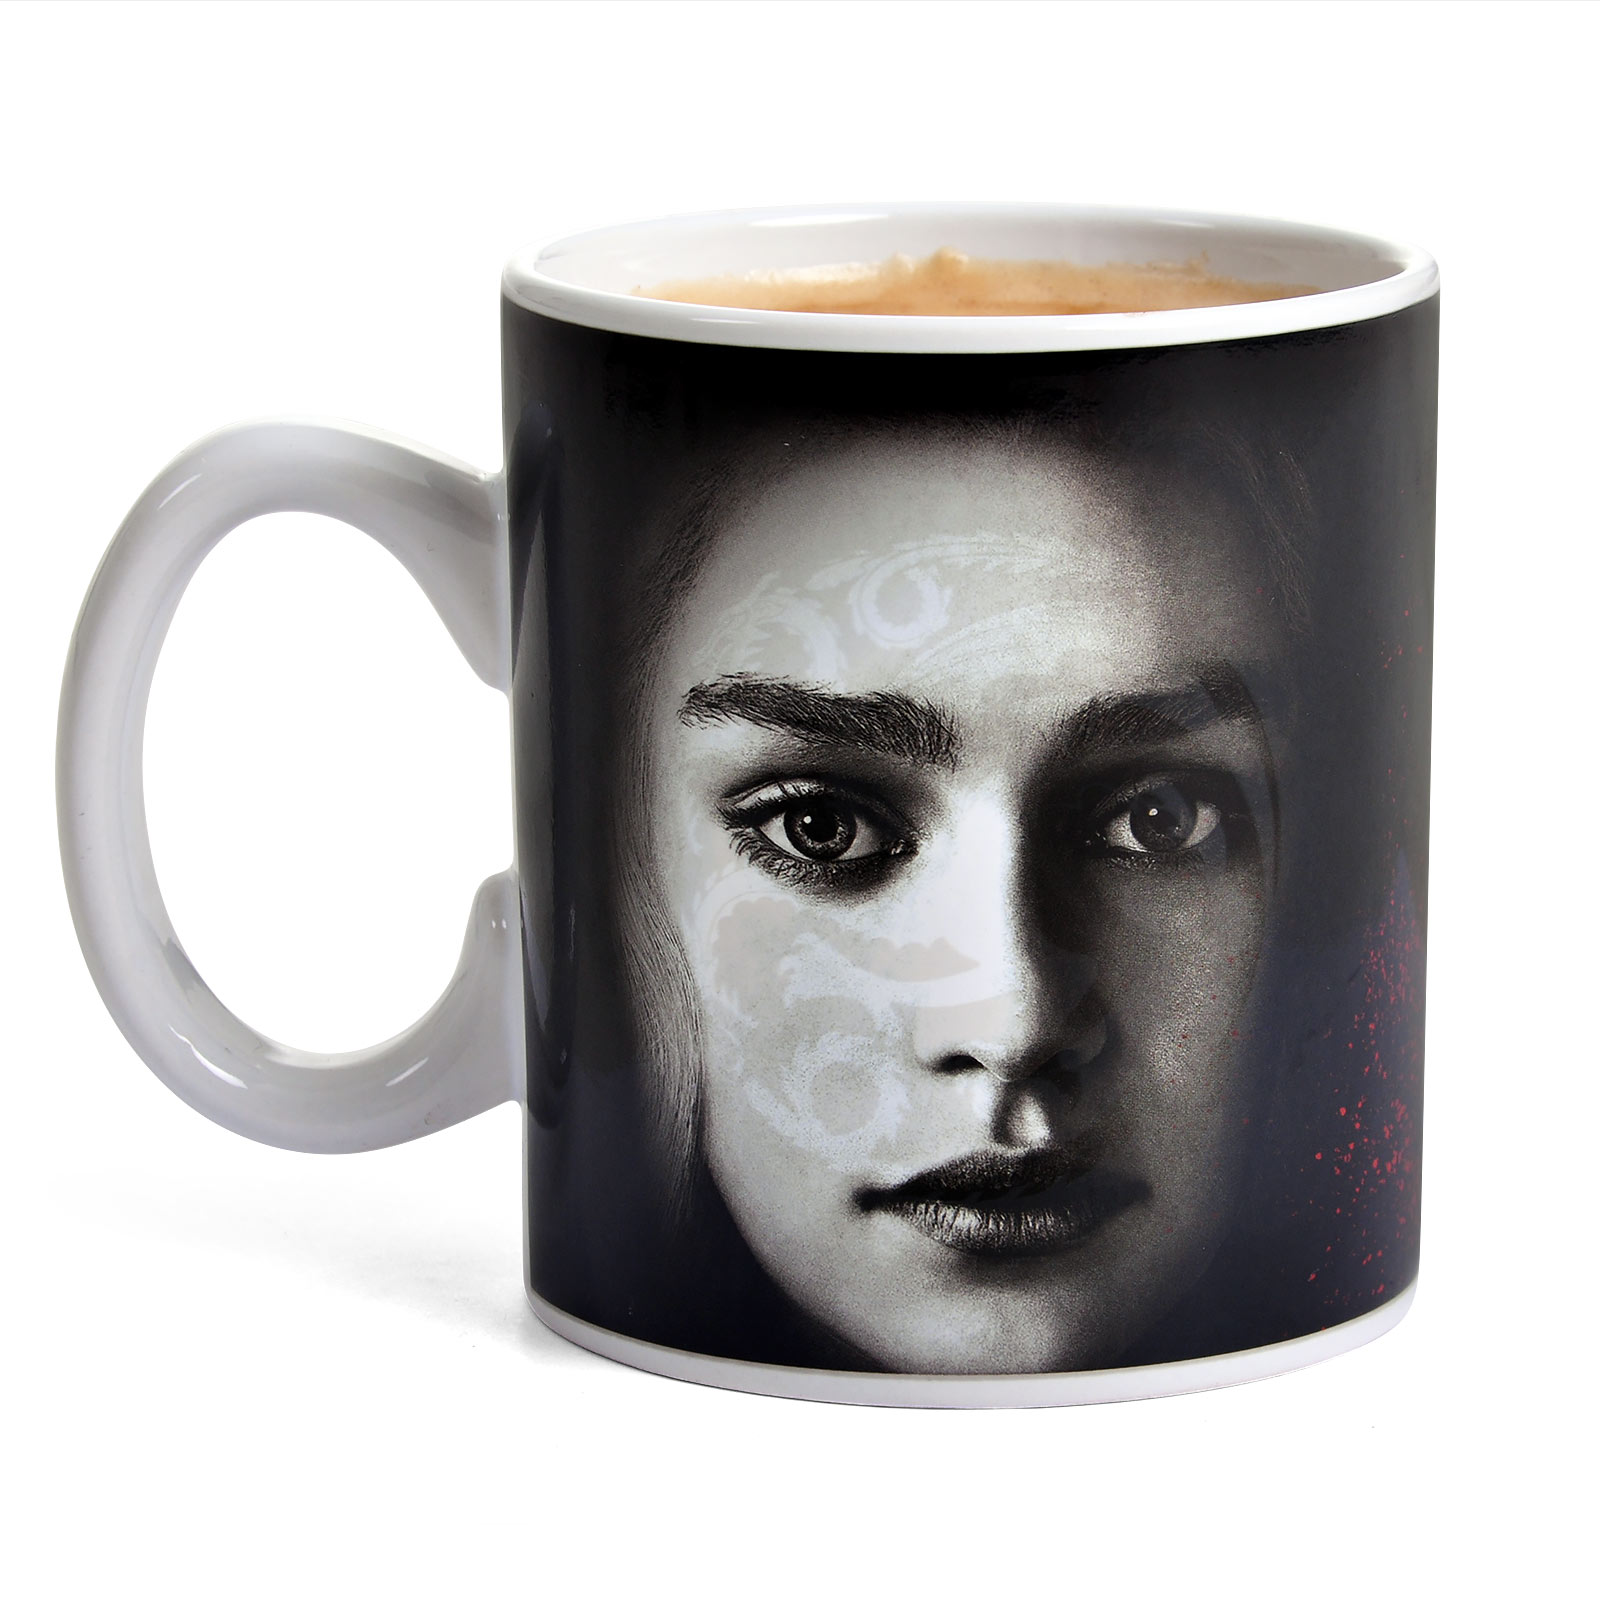 Game of Thrones - Daenerys Thermoeffekt Tasse